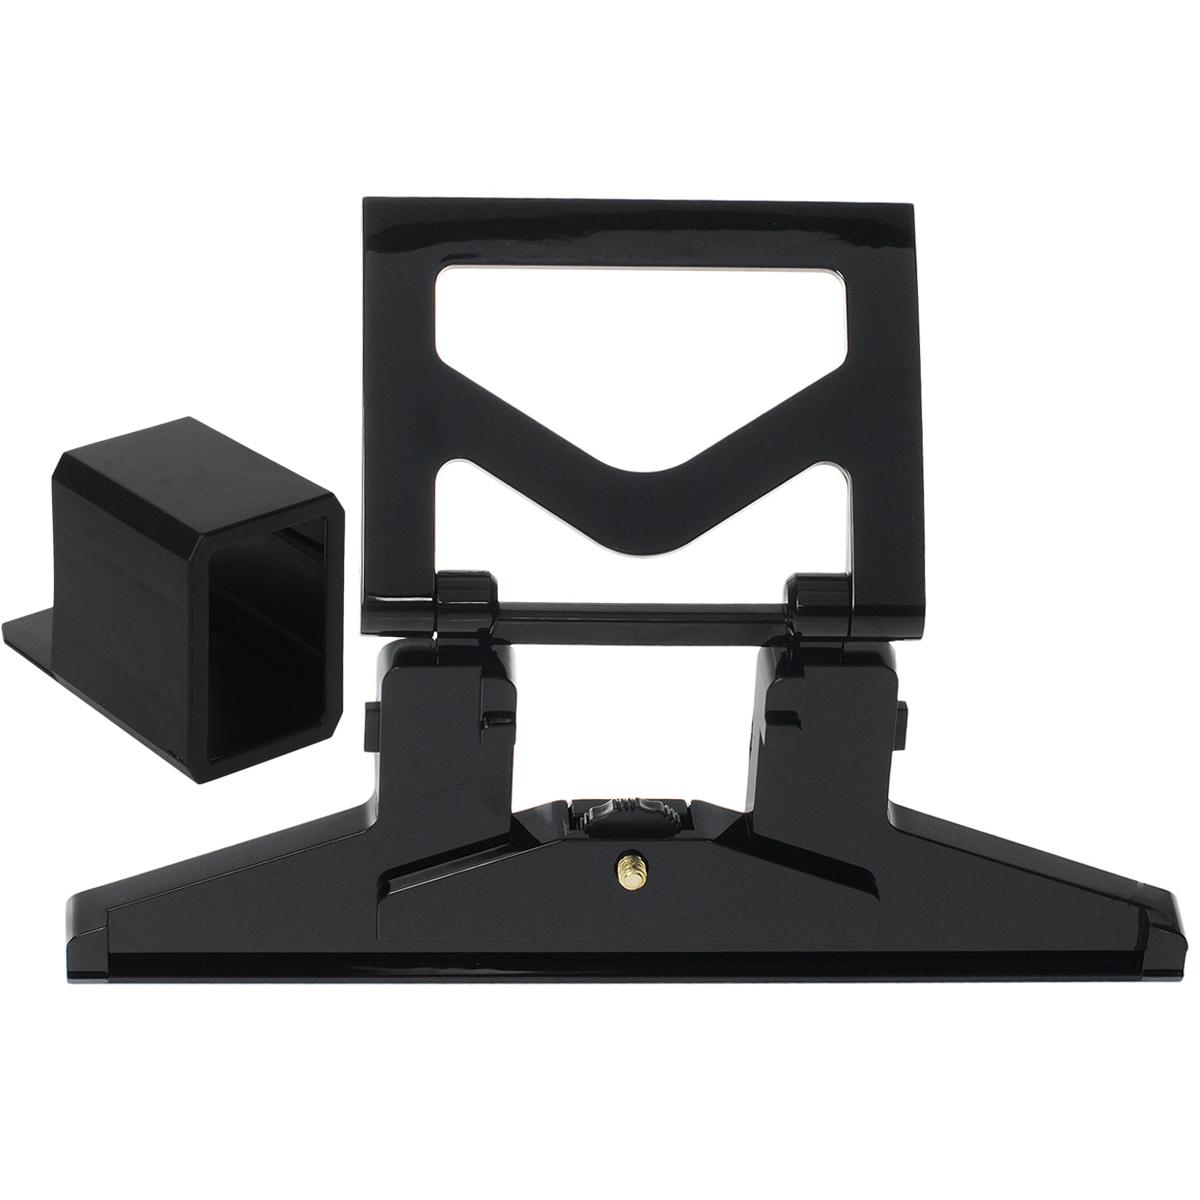 Крепление на телевизор Black Horns для Kinect Xbox One